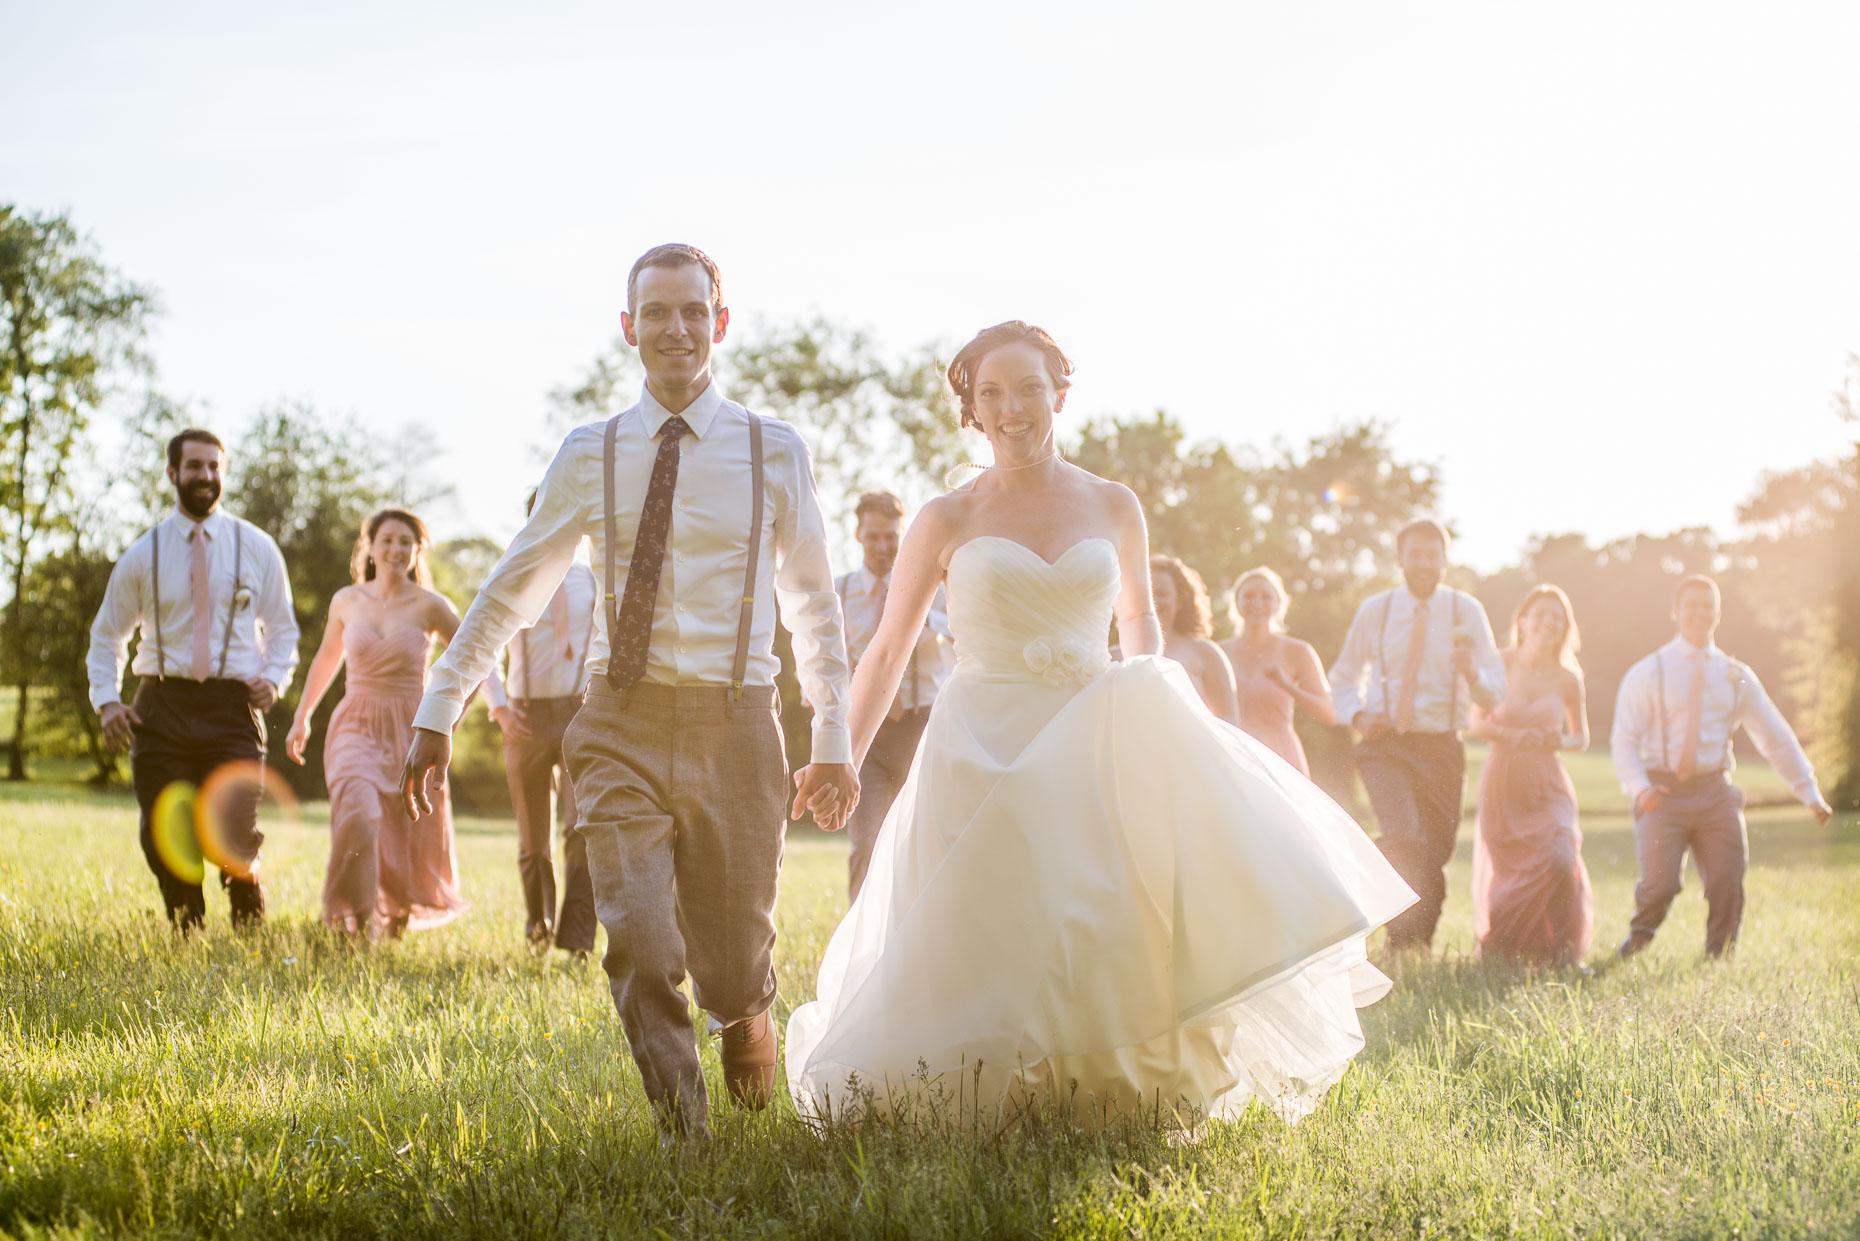 Weddings by Elliott O'Donovan - Washington DC_-32.jpg